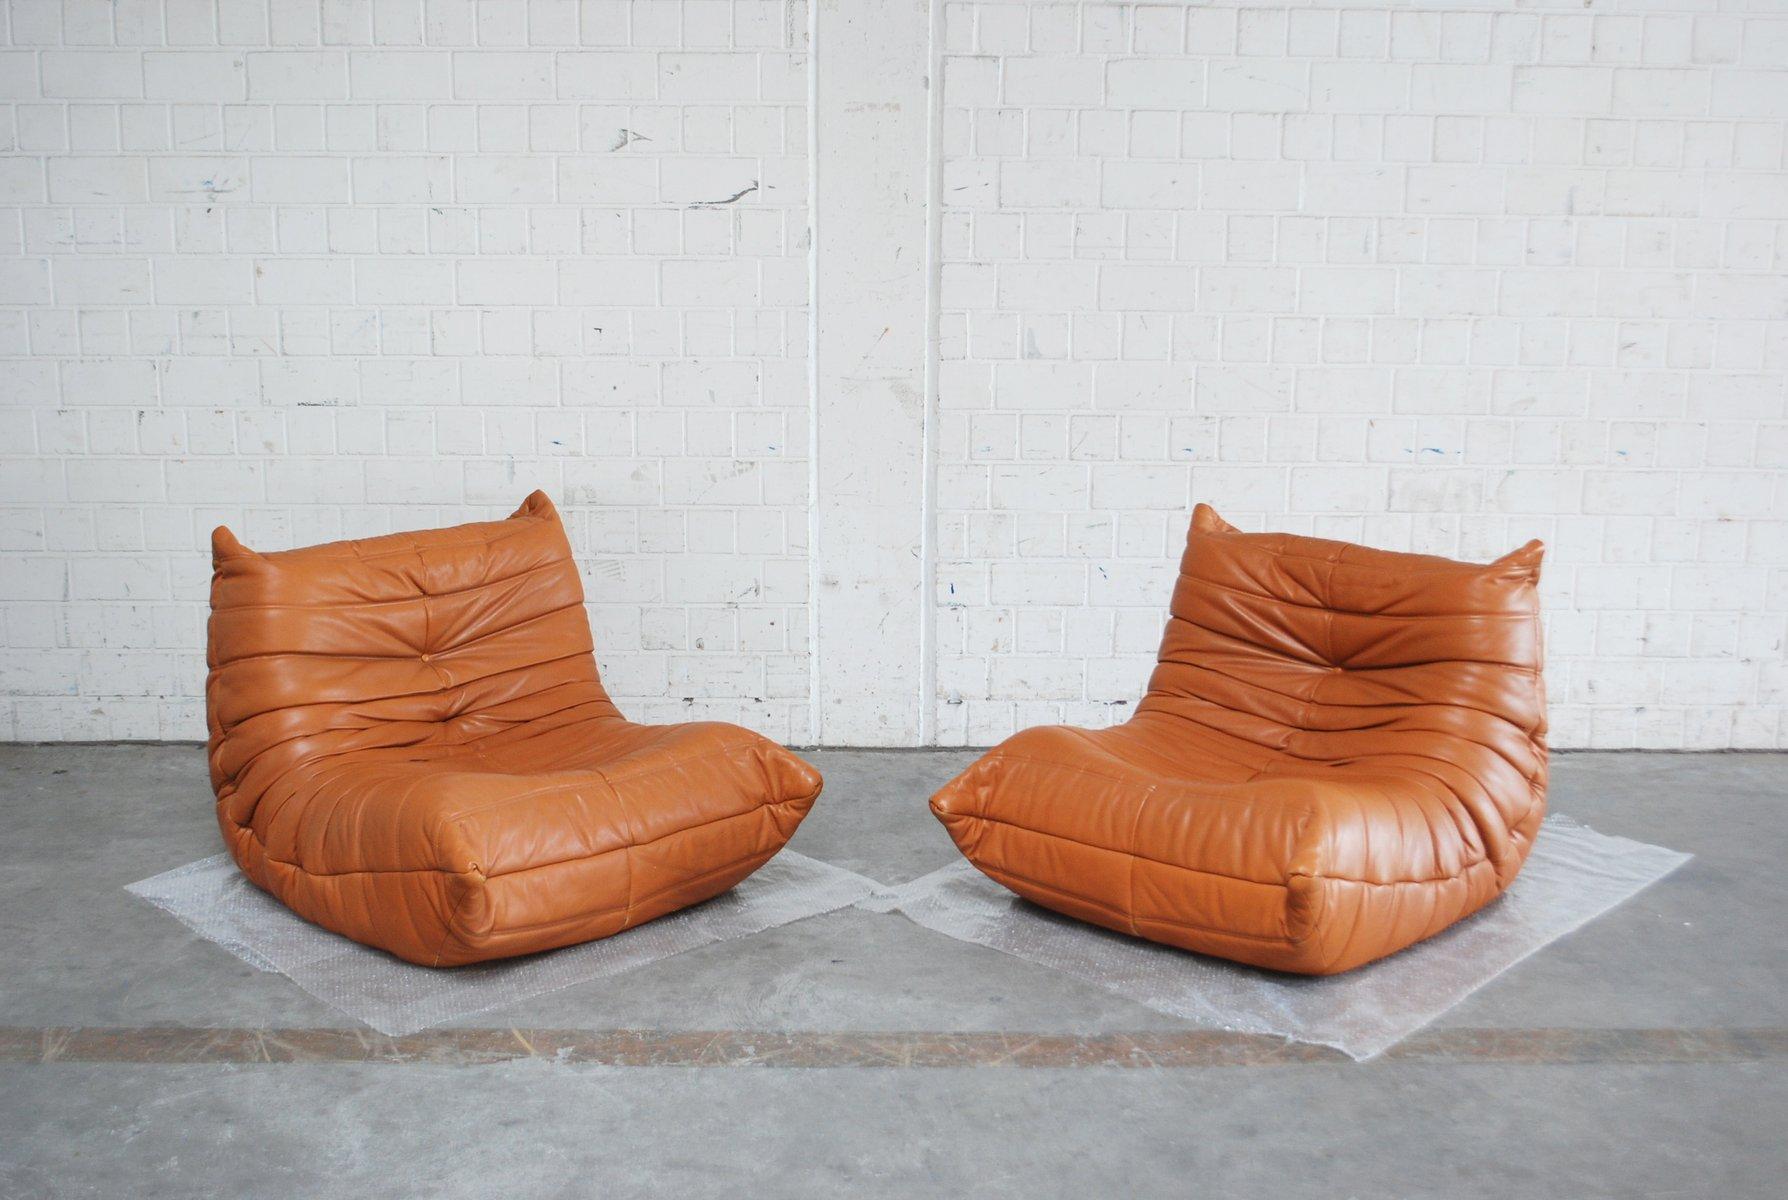 togo sessel aus kastanienbraunem leder von michel ducaroy f r ligne roset 1980er bei pamono kaufen. Black Bedroom Furniture Sets. Home Design Ideas